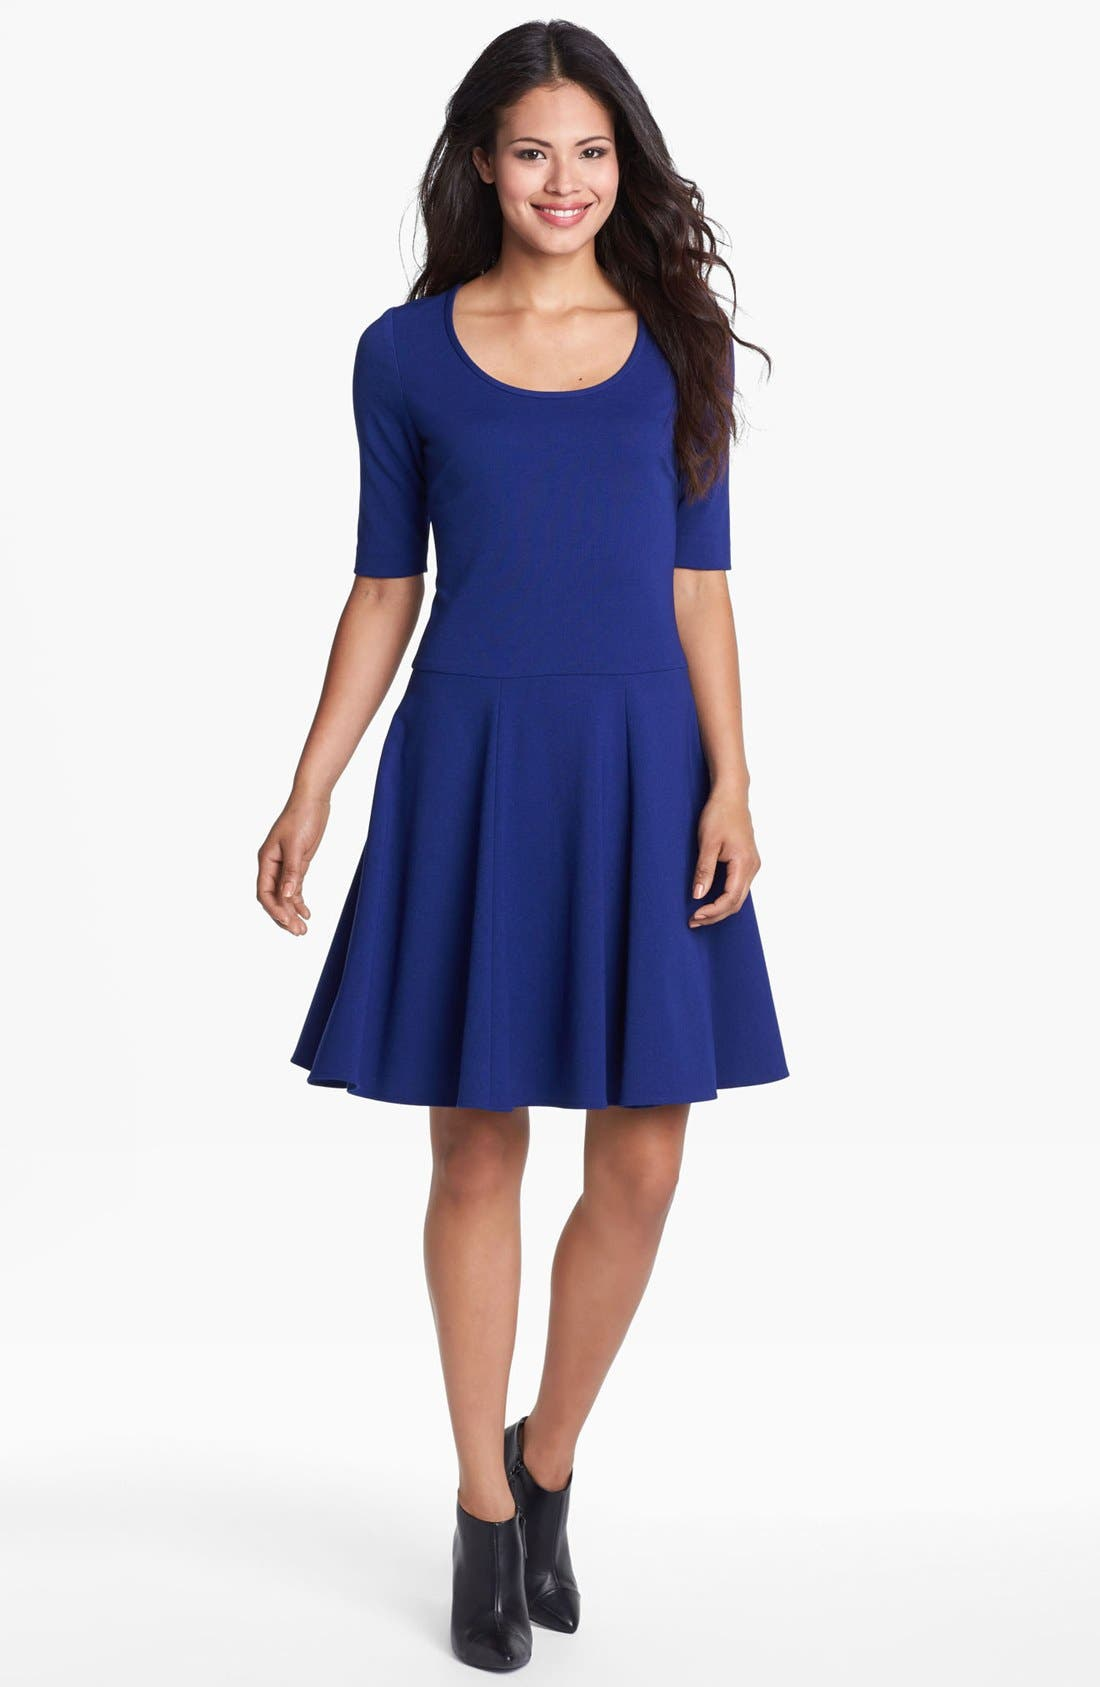 Alternate Image 1 Selected - Eliza J Seamed Skater Dress (Petite)